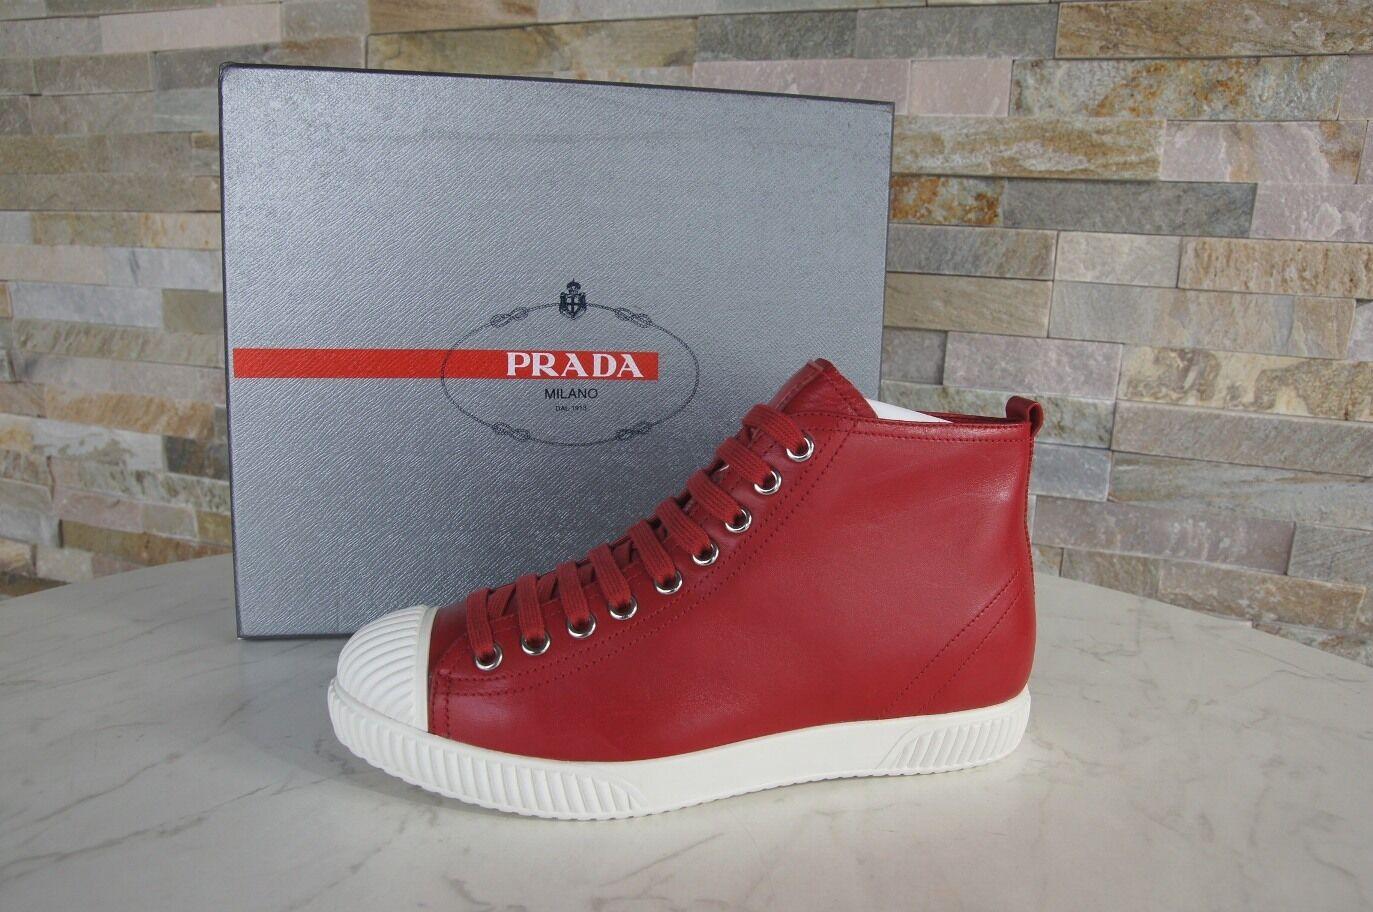 PRADA TAGLIA 37,5 High-Top    3t5877 normalissime scarpe rosso nuovo ex UVP 2af36d